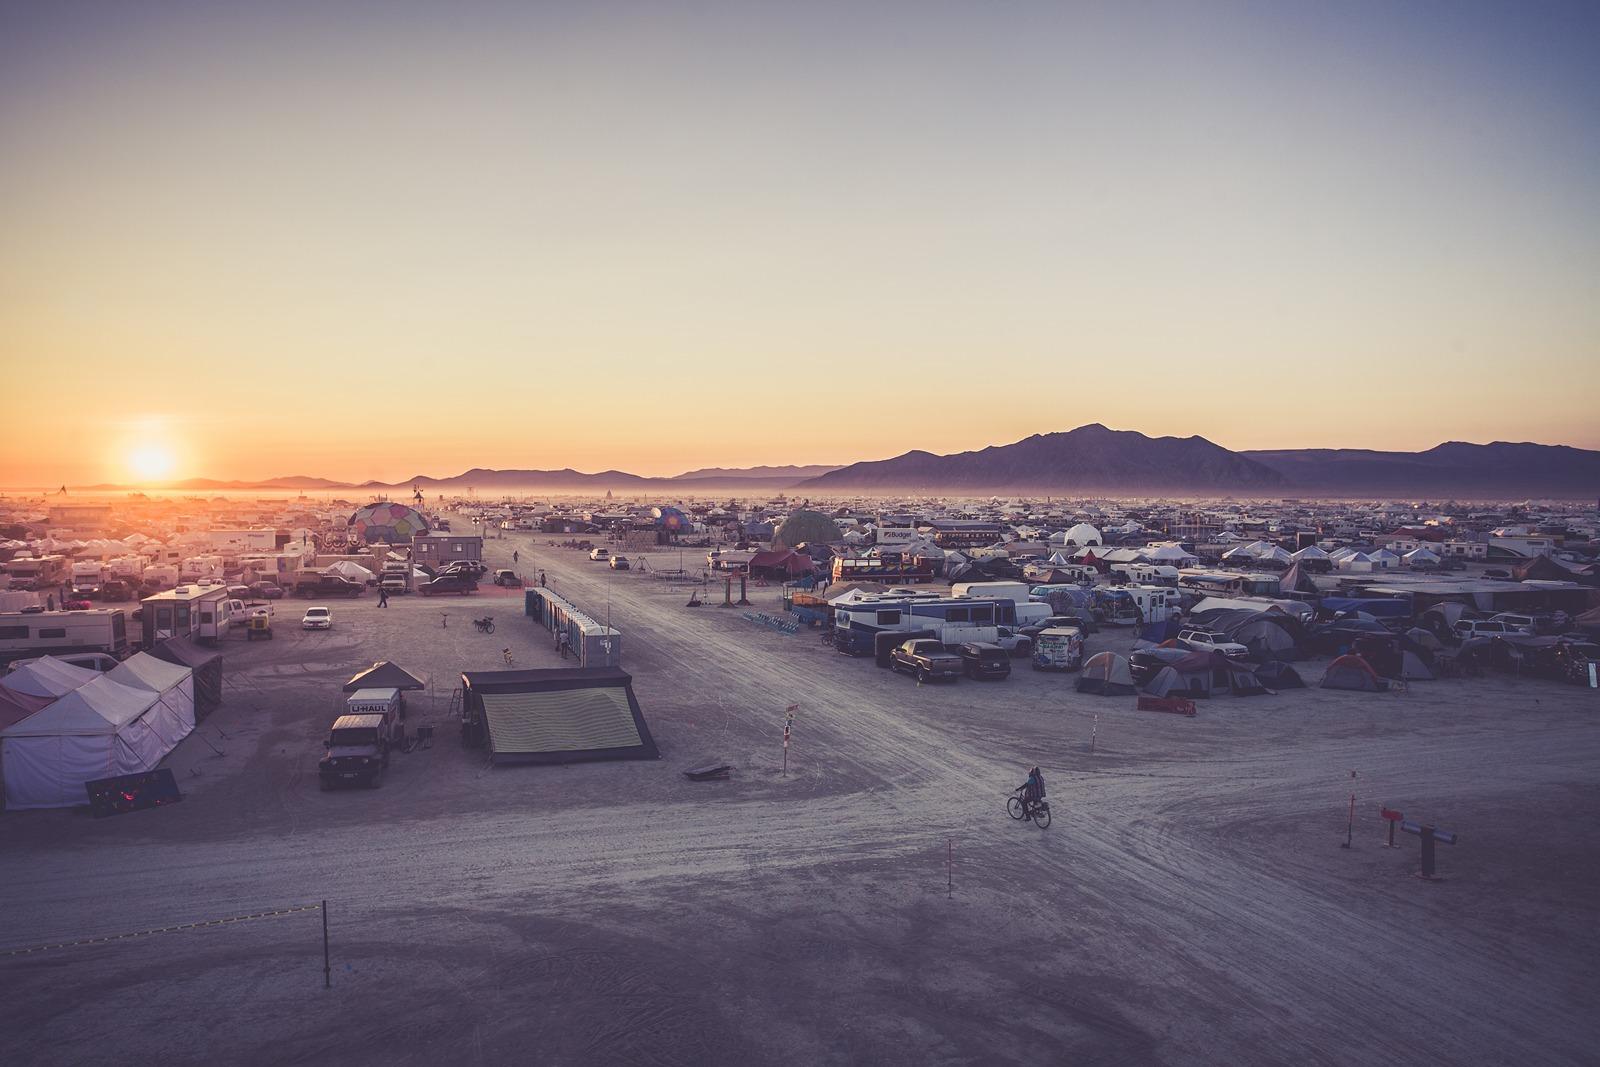 Burning Man - First rising sun